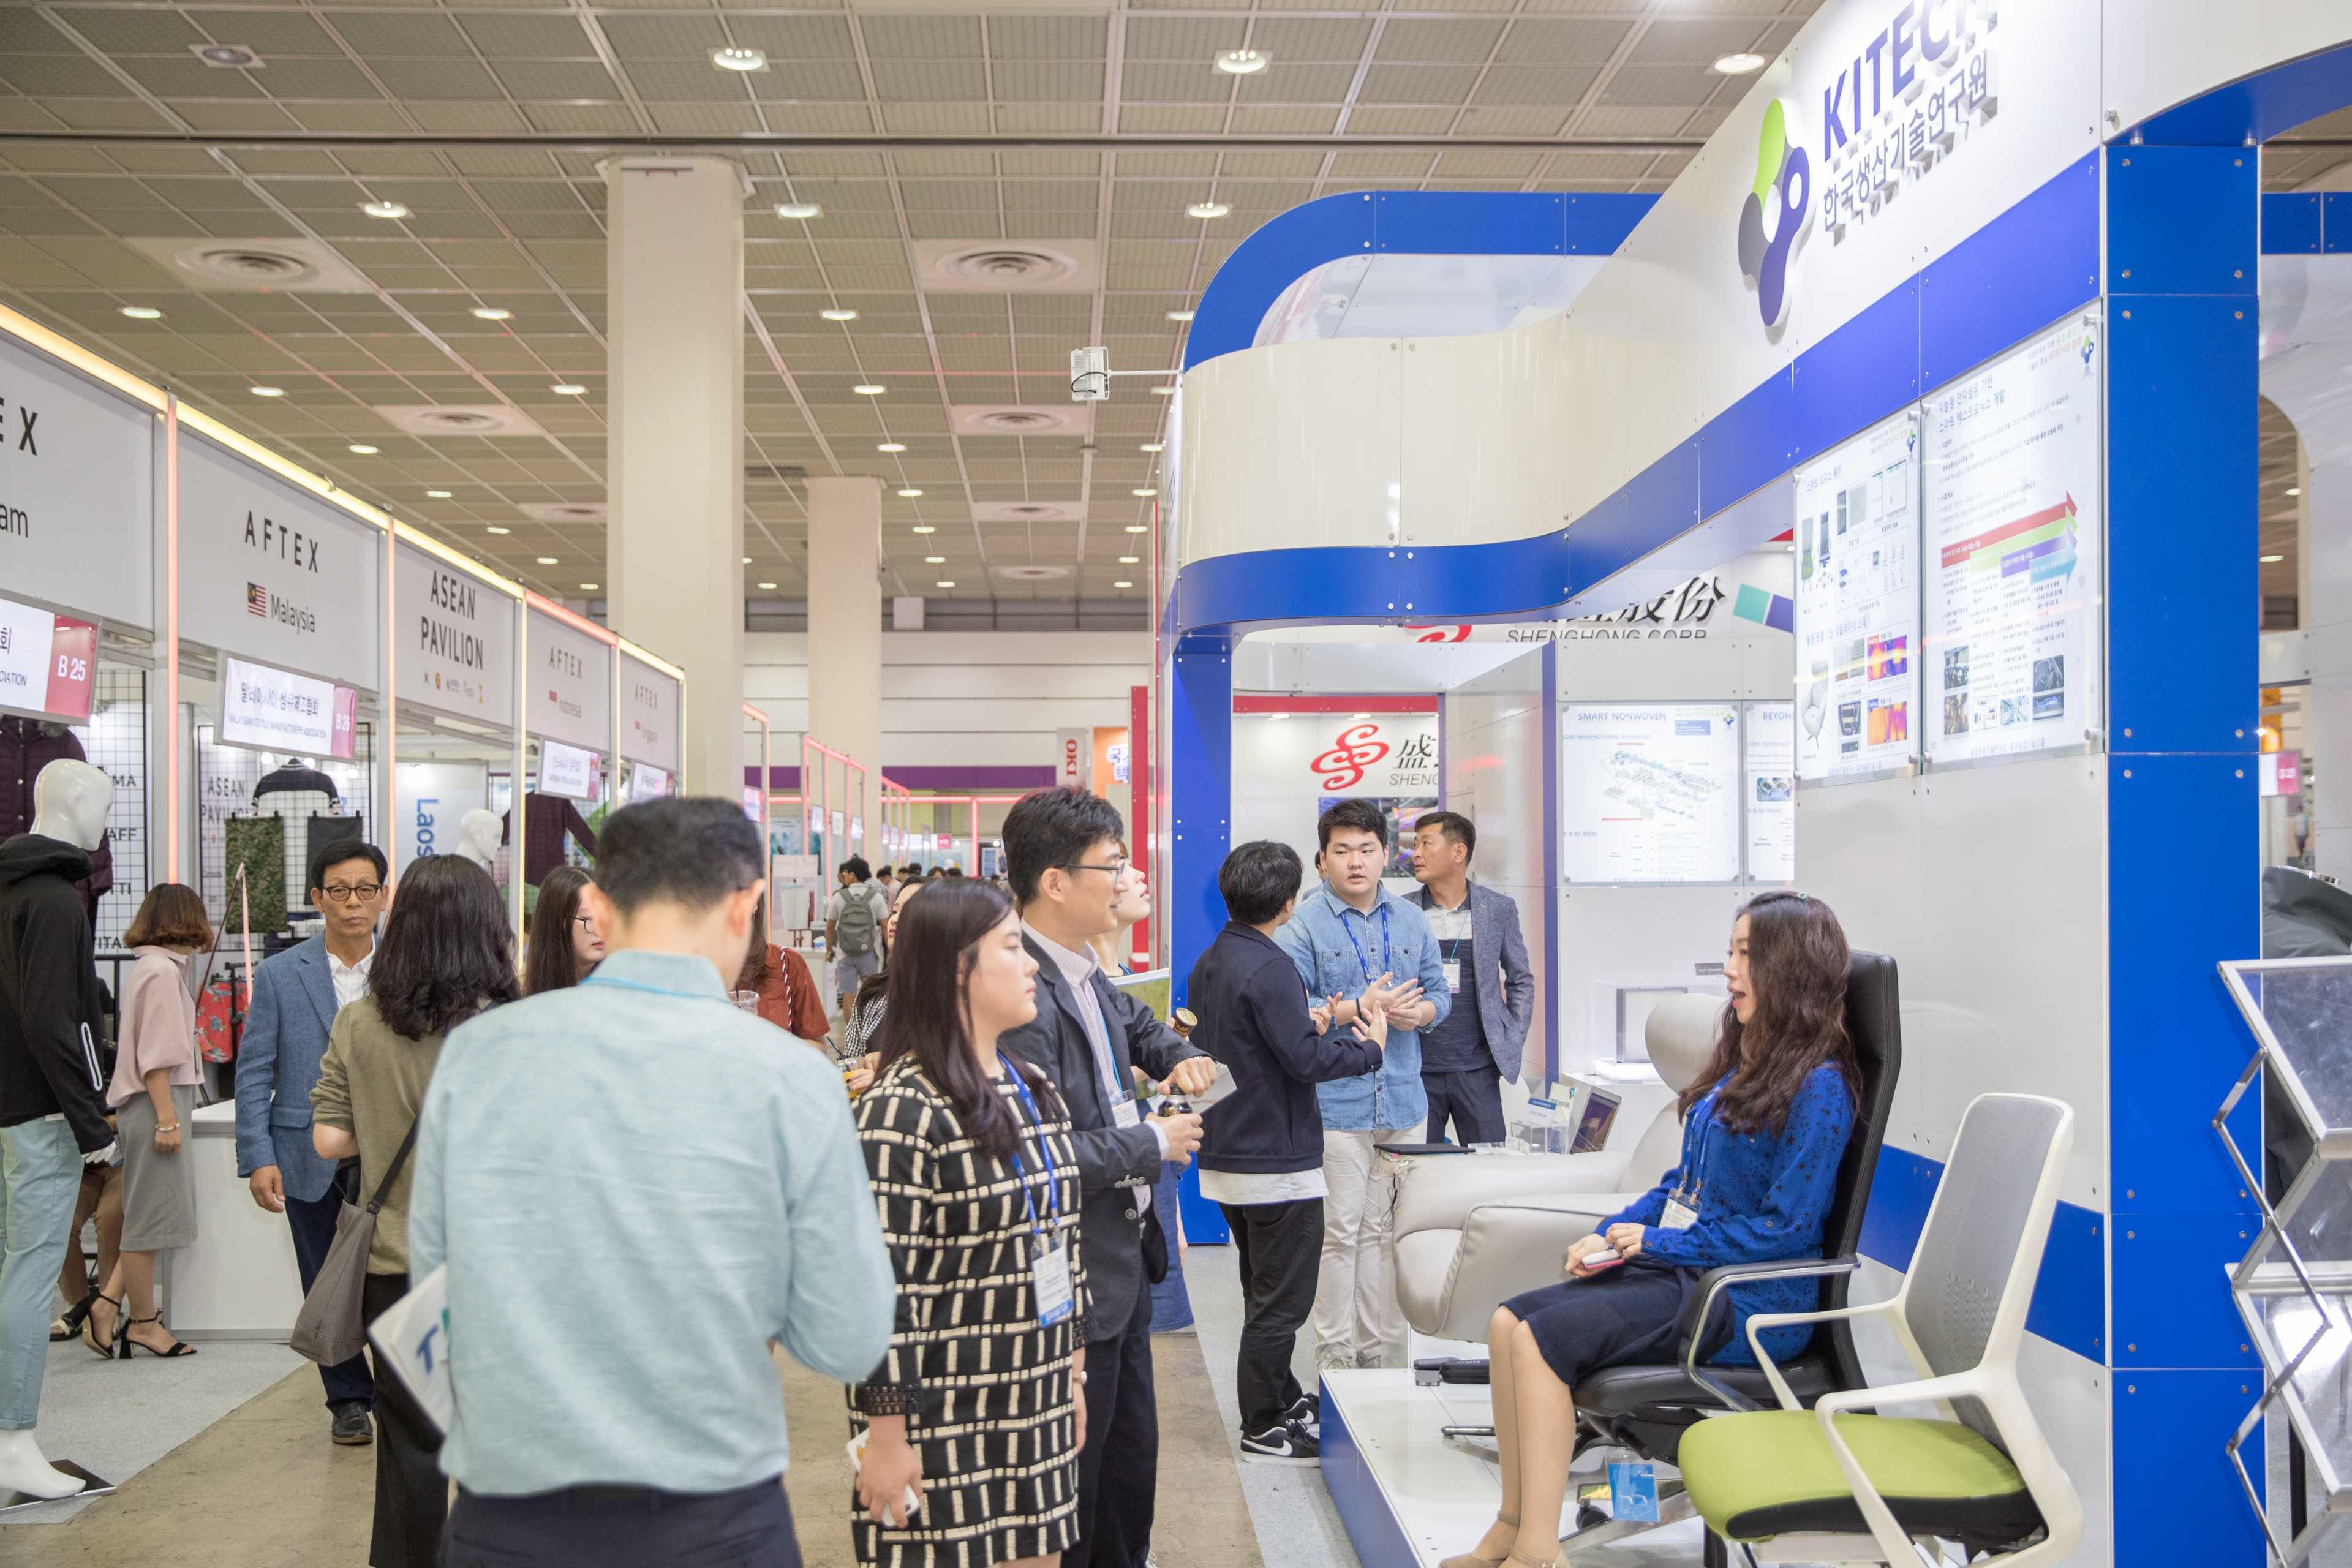 2018年韩国国际纺织展览会 Preview in Seoul